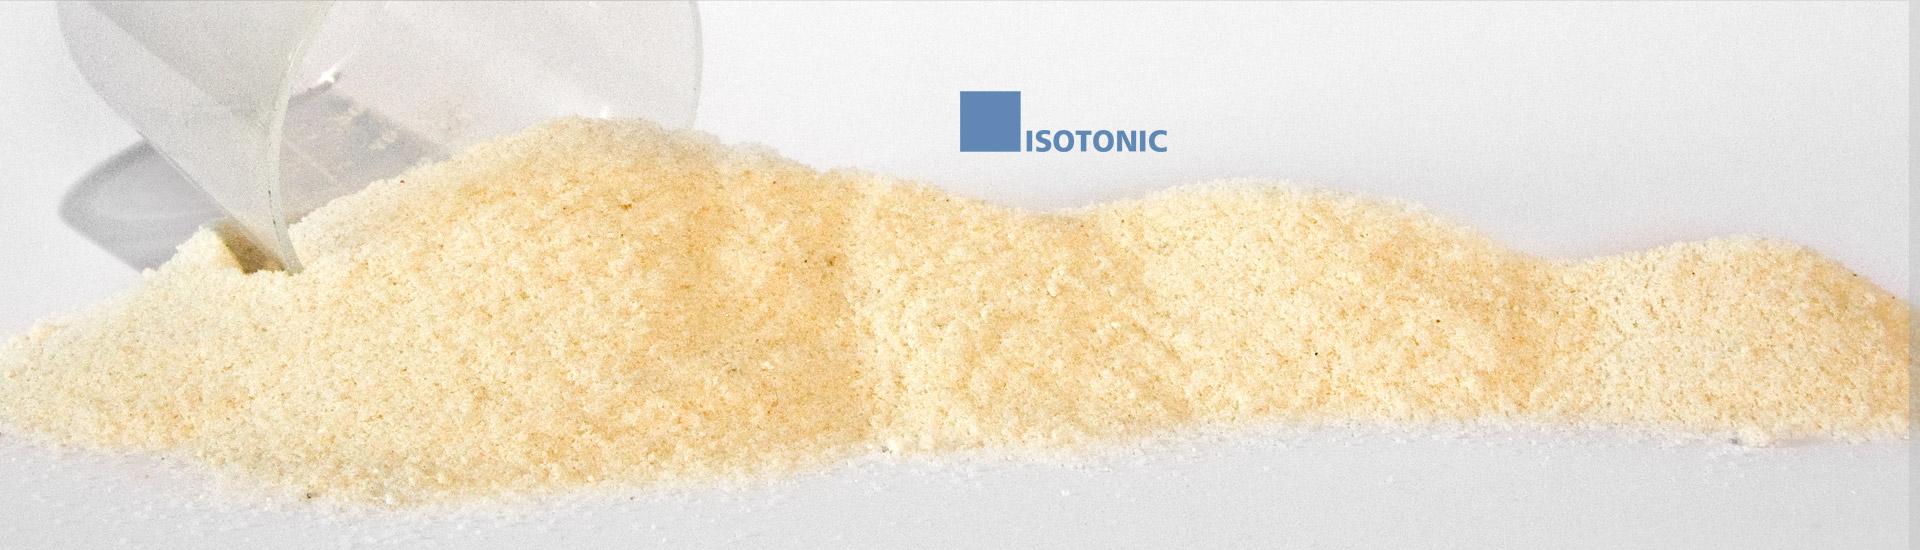 equinova-isotonic